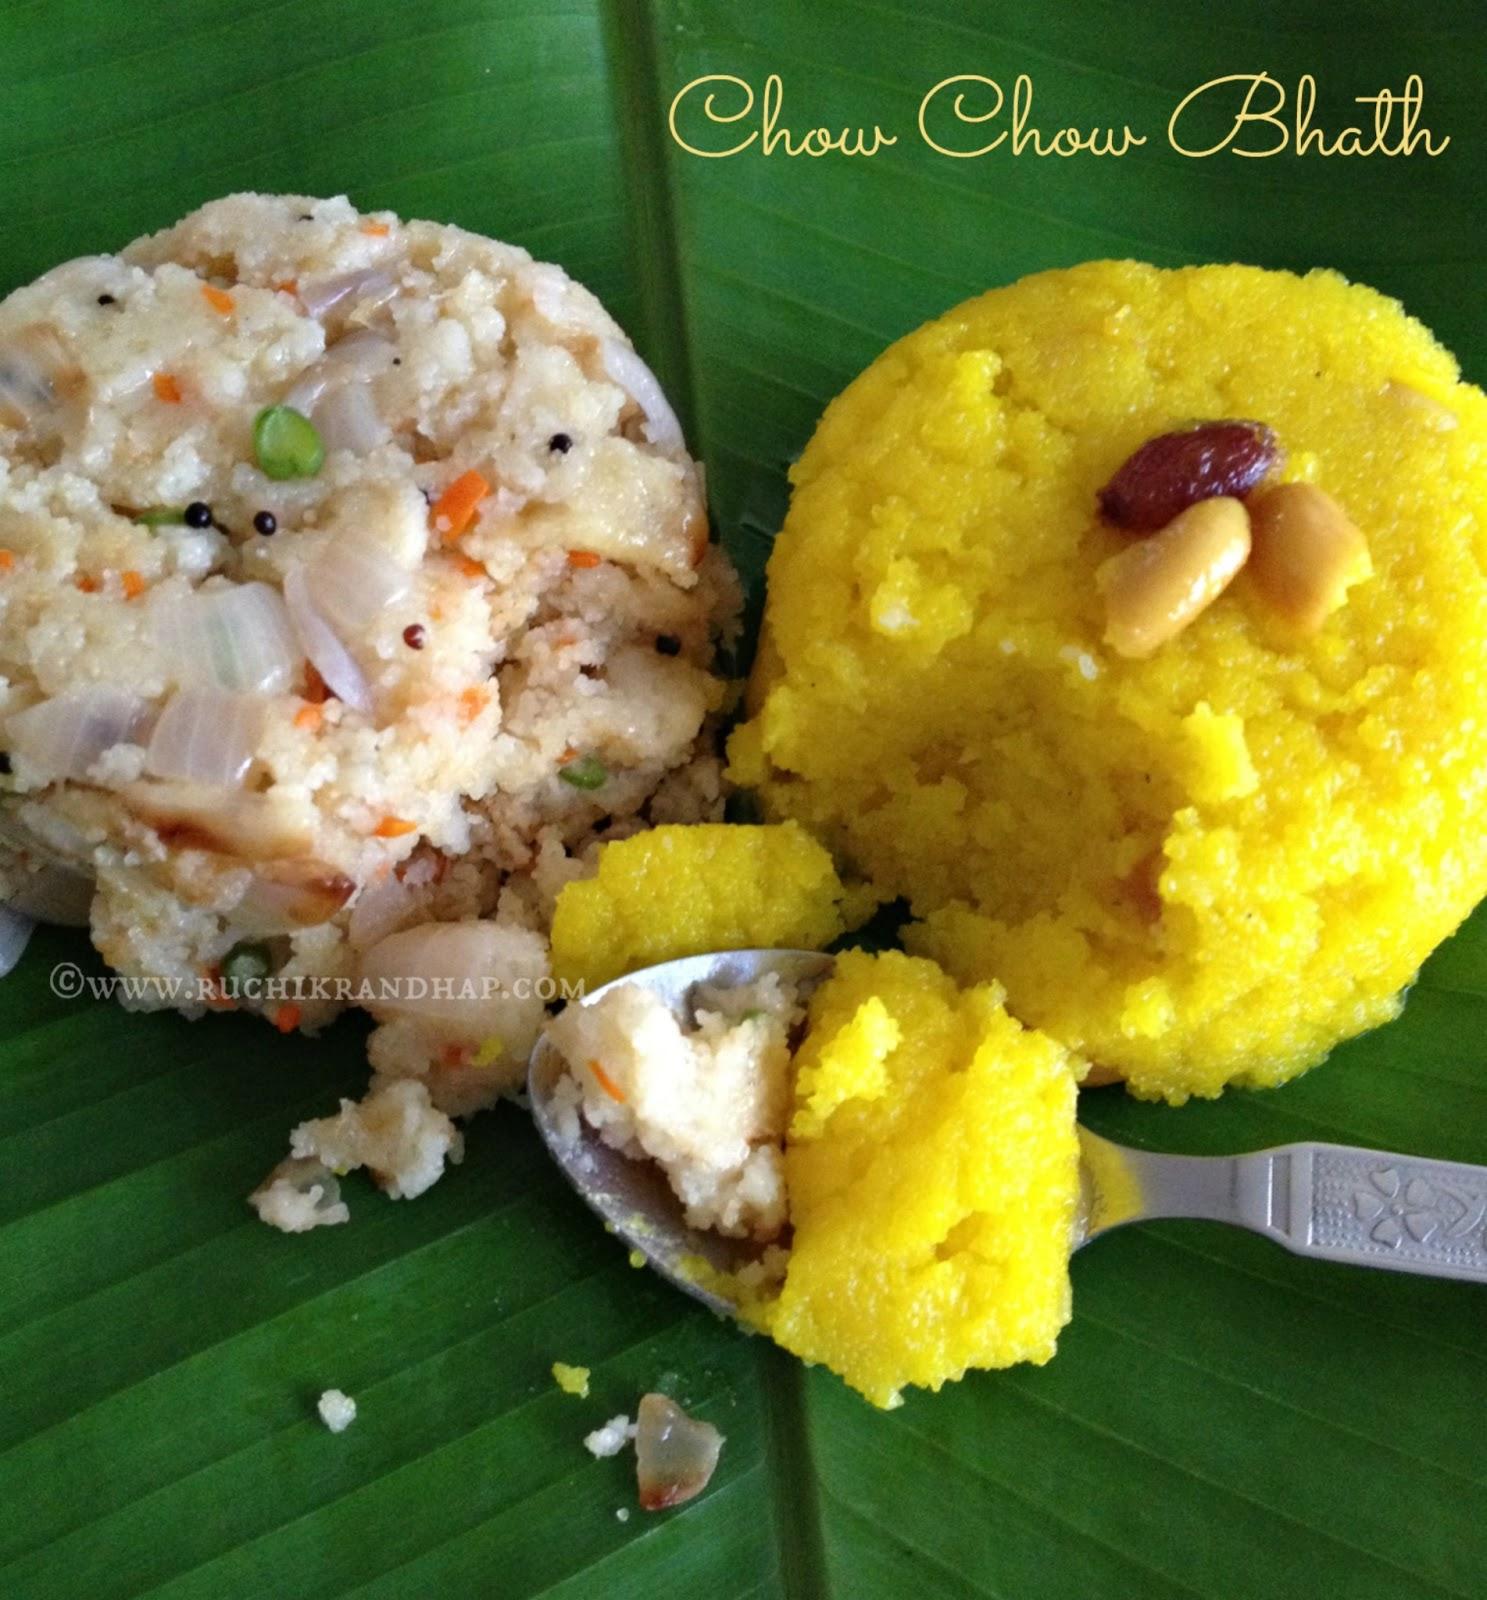 Chow chow bhath karnataka style sweet savoury semolina chow chow bhath karnataka style sweet savoury semolina breakfast combo forumfinder Gallery